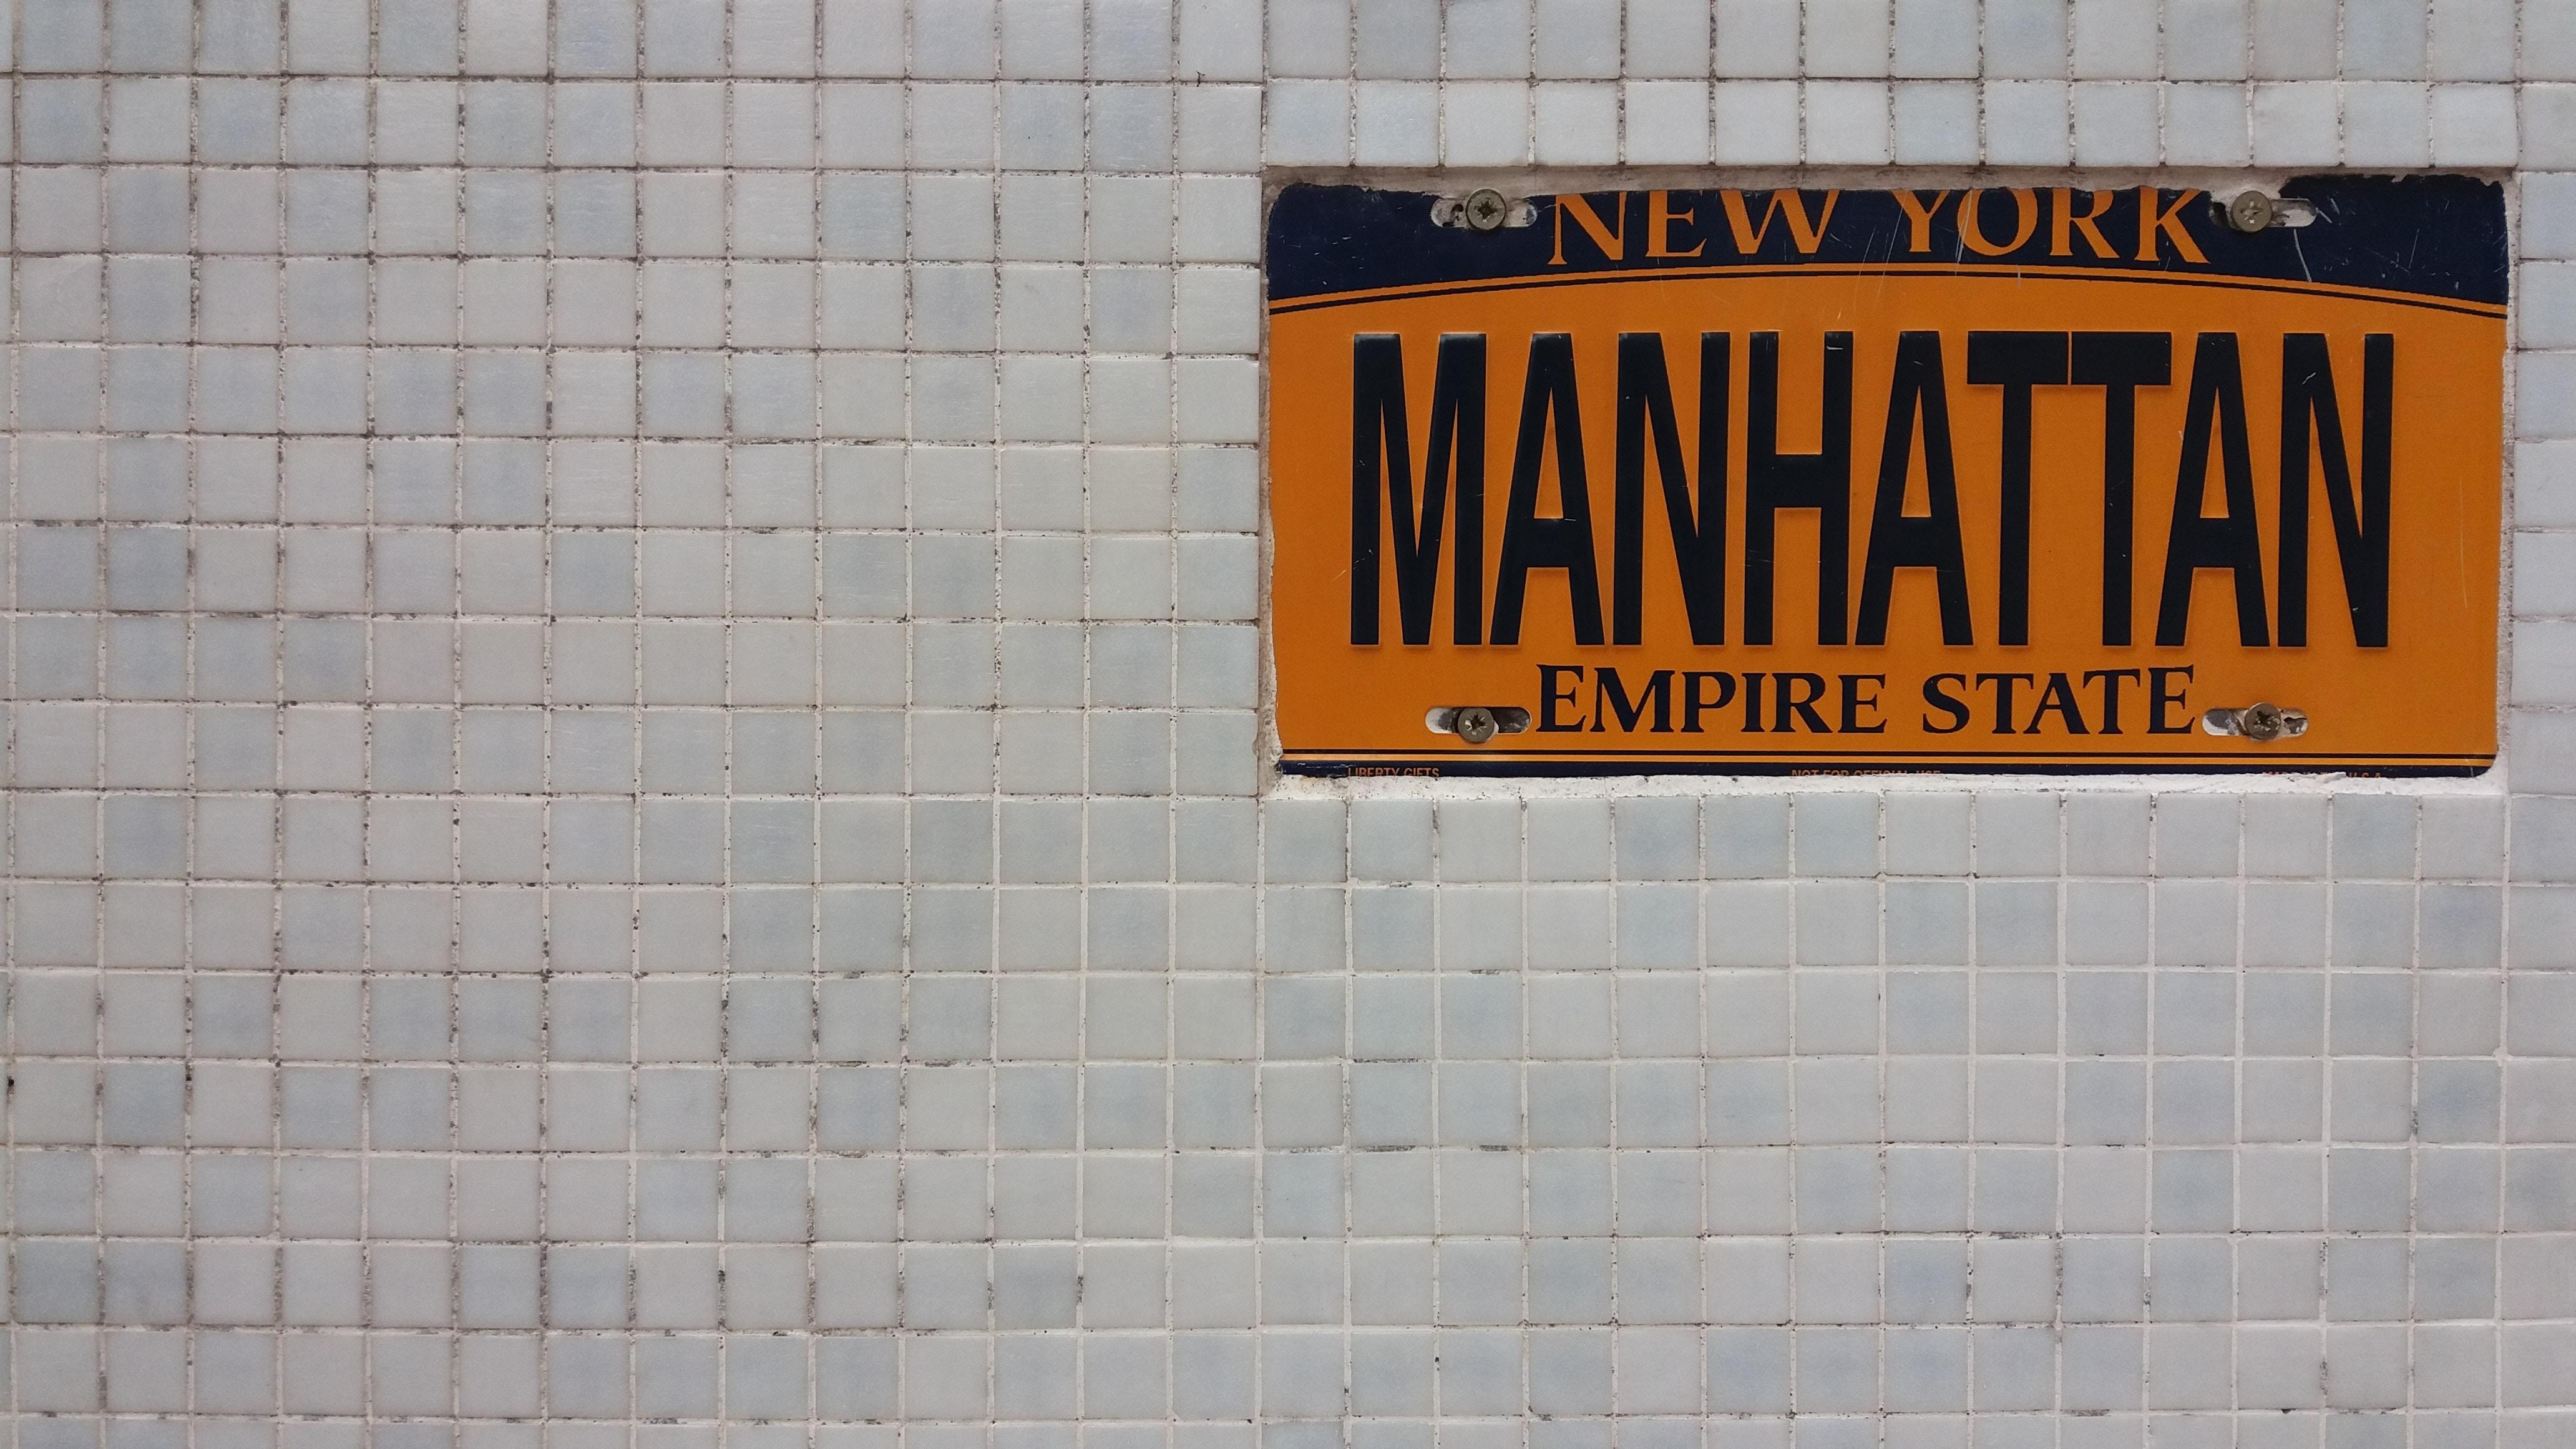 New York Manhattan license plate holder on wall